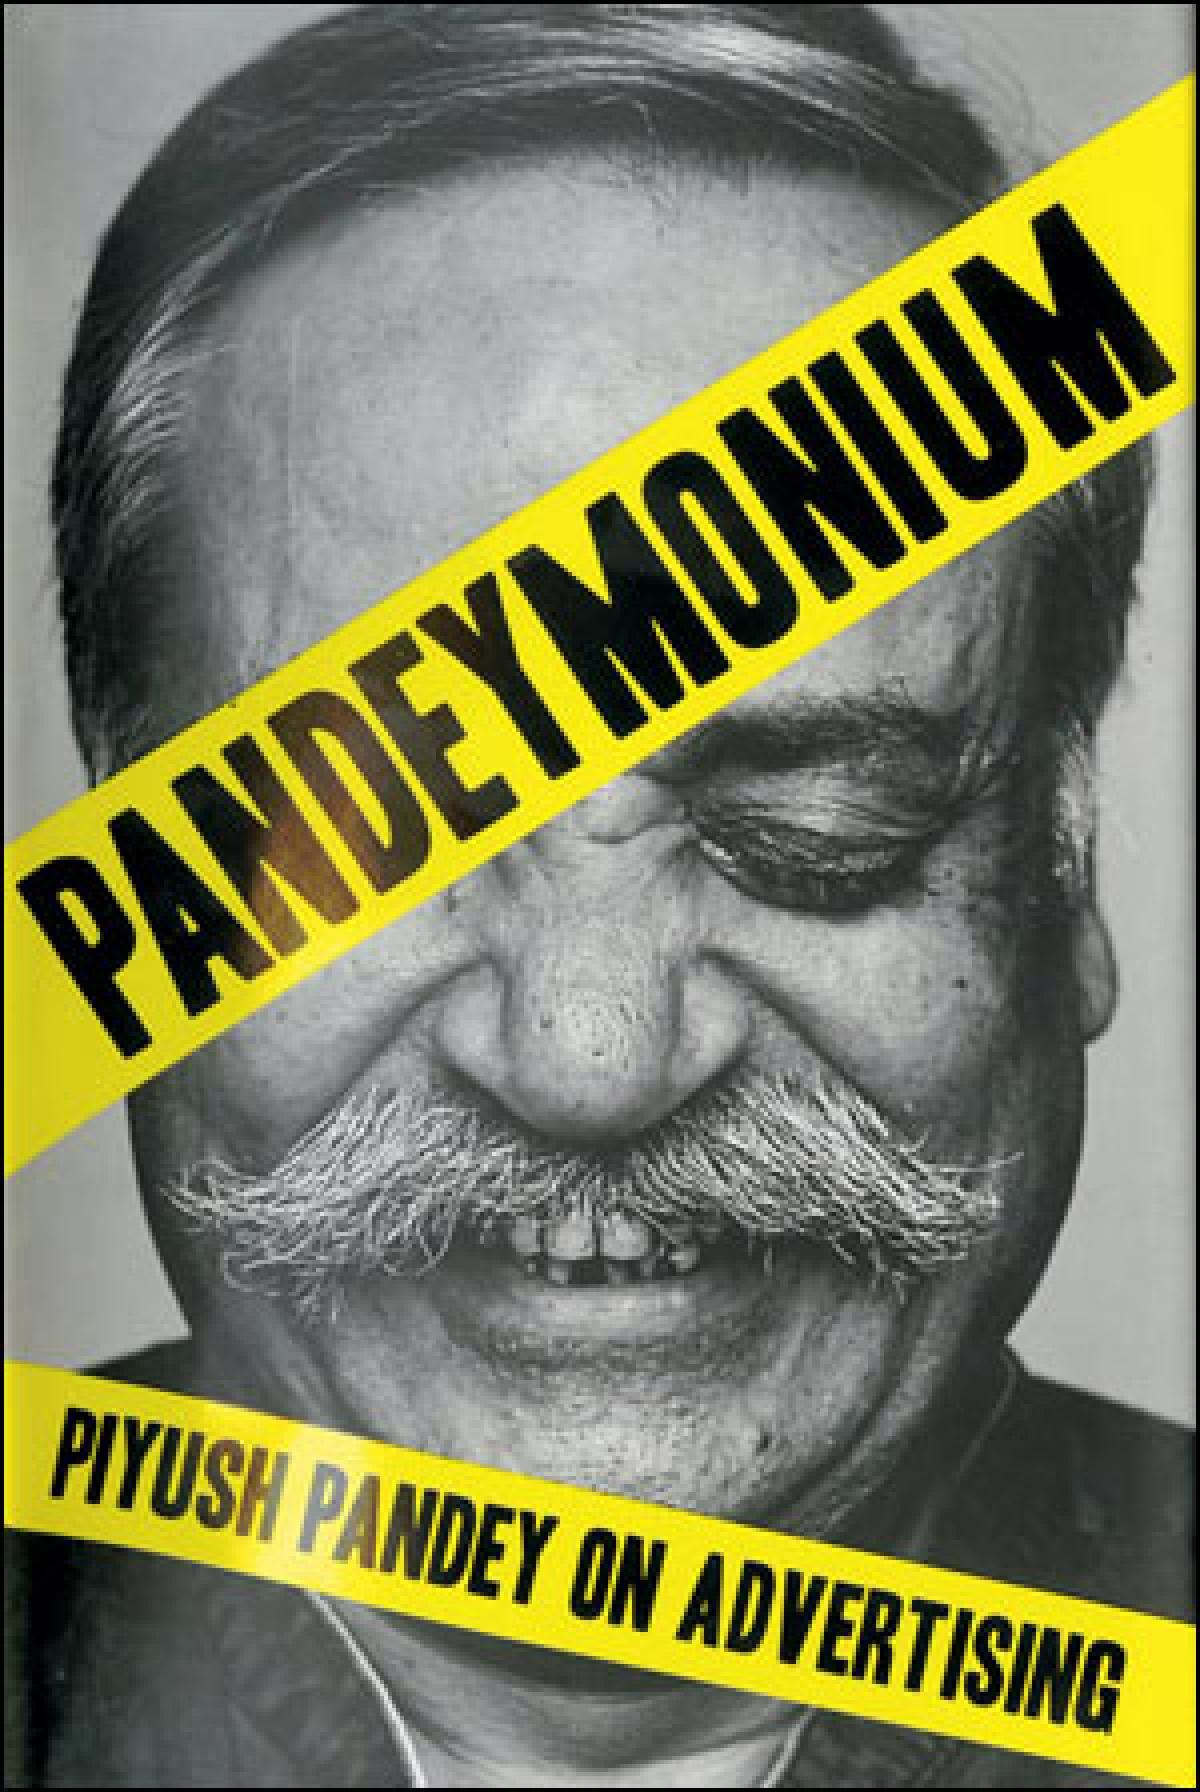 Piyush creates 'Pandeymonium'